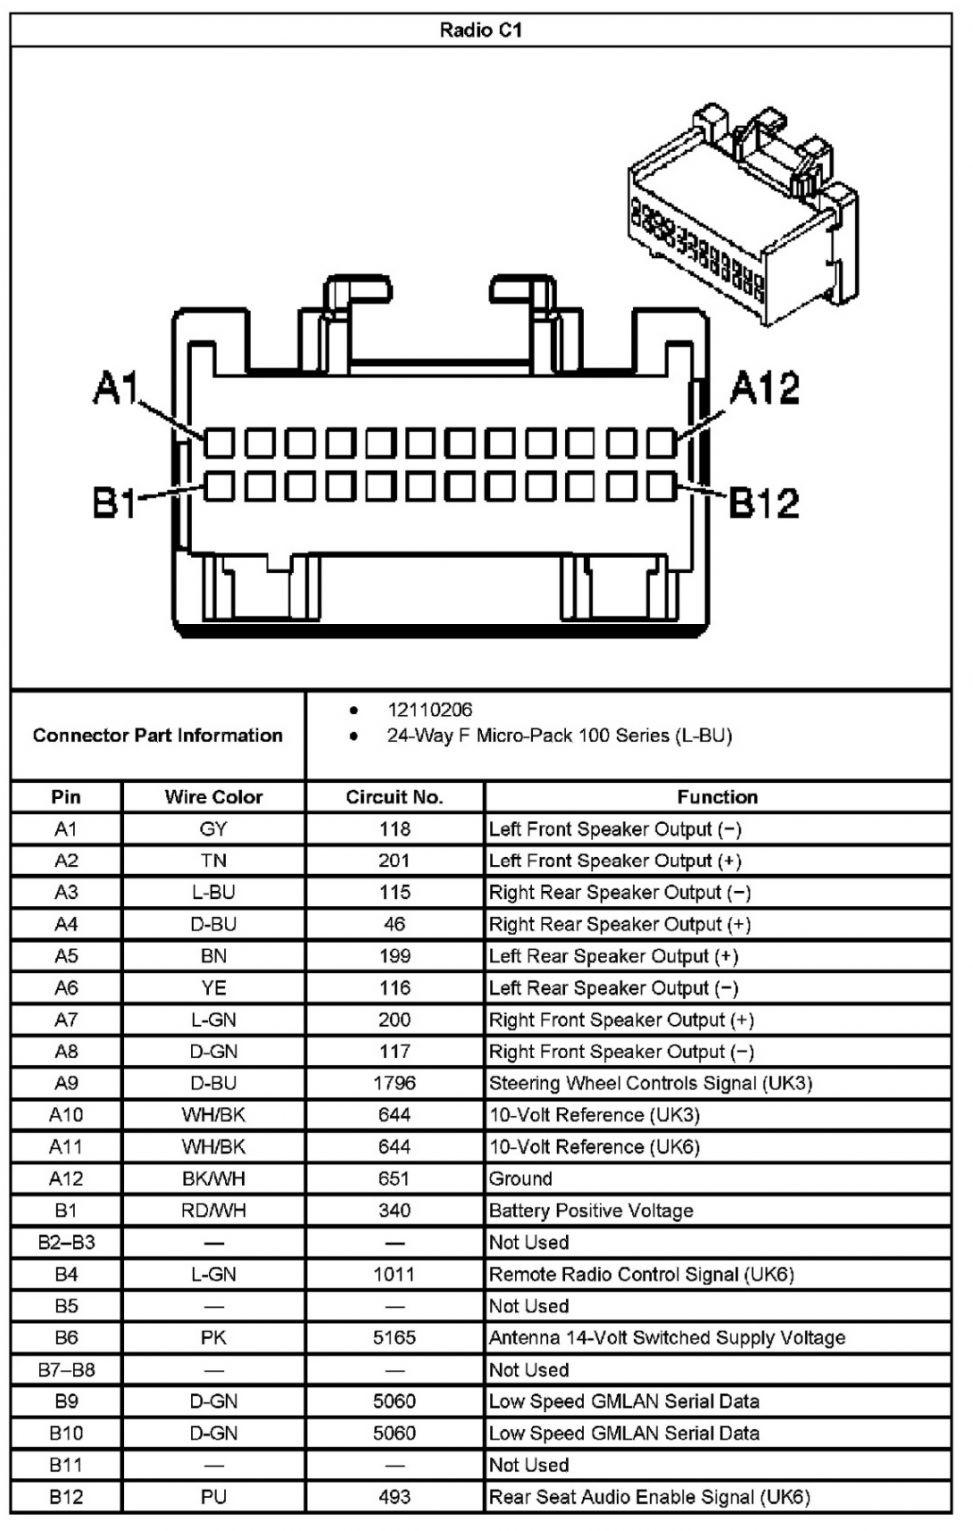 03 Chevy Malibu Wiring Diagram - Wiring Diagram Direct jest-course -  jest-course.siciliabeb.it | Wiring Diagram For 2003 Chevy Malibu |  | jest-course.siciliabeb.it